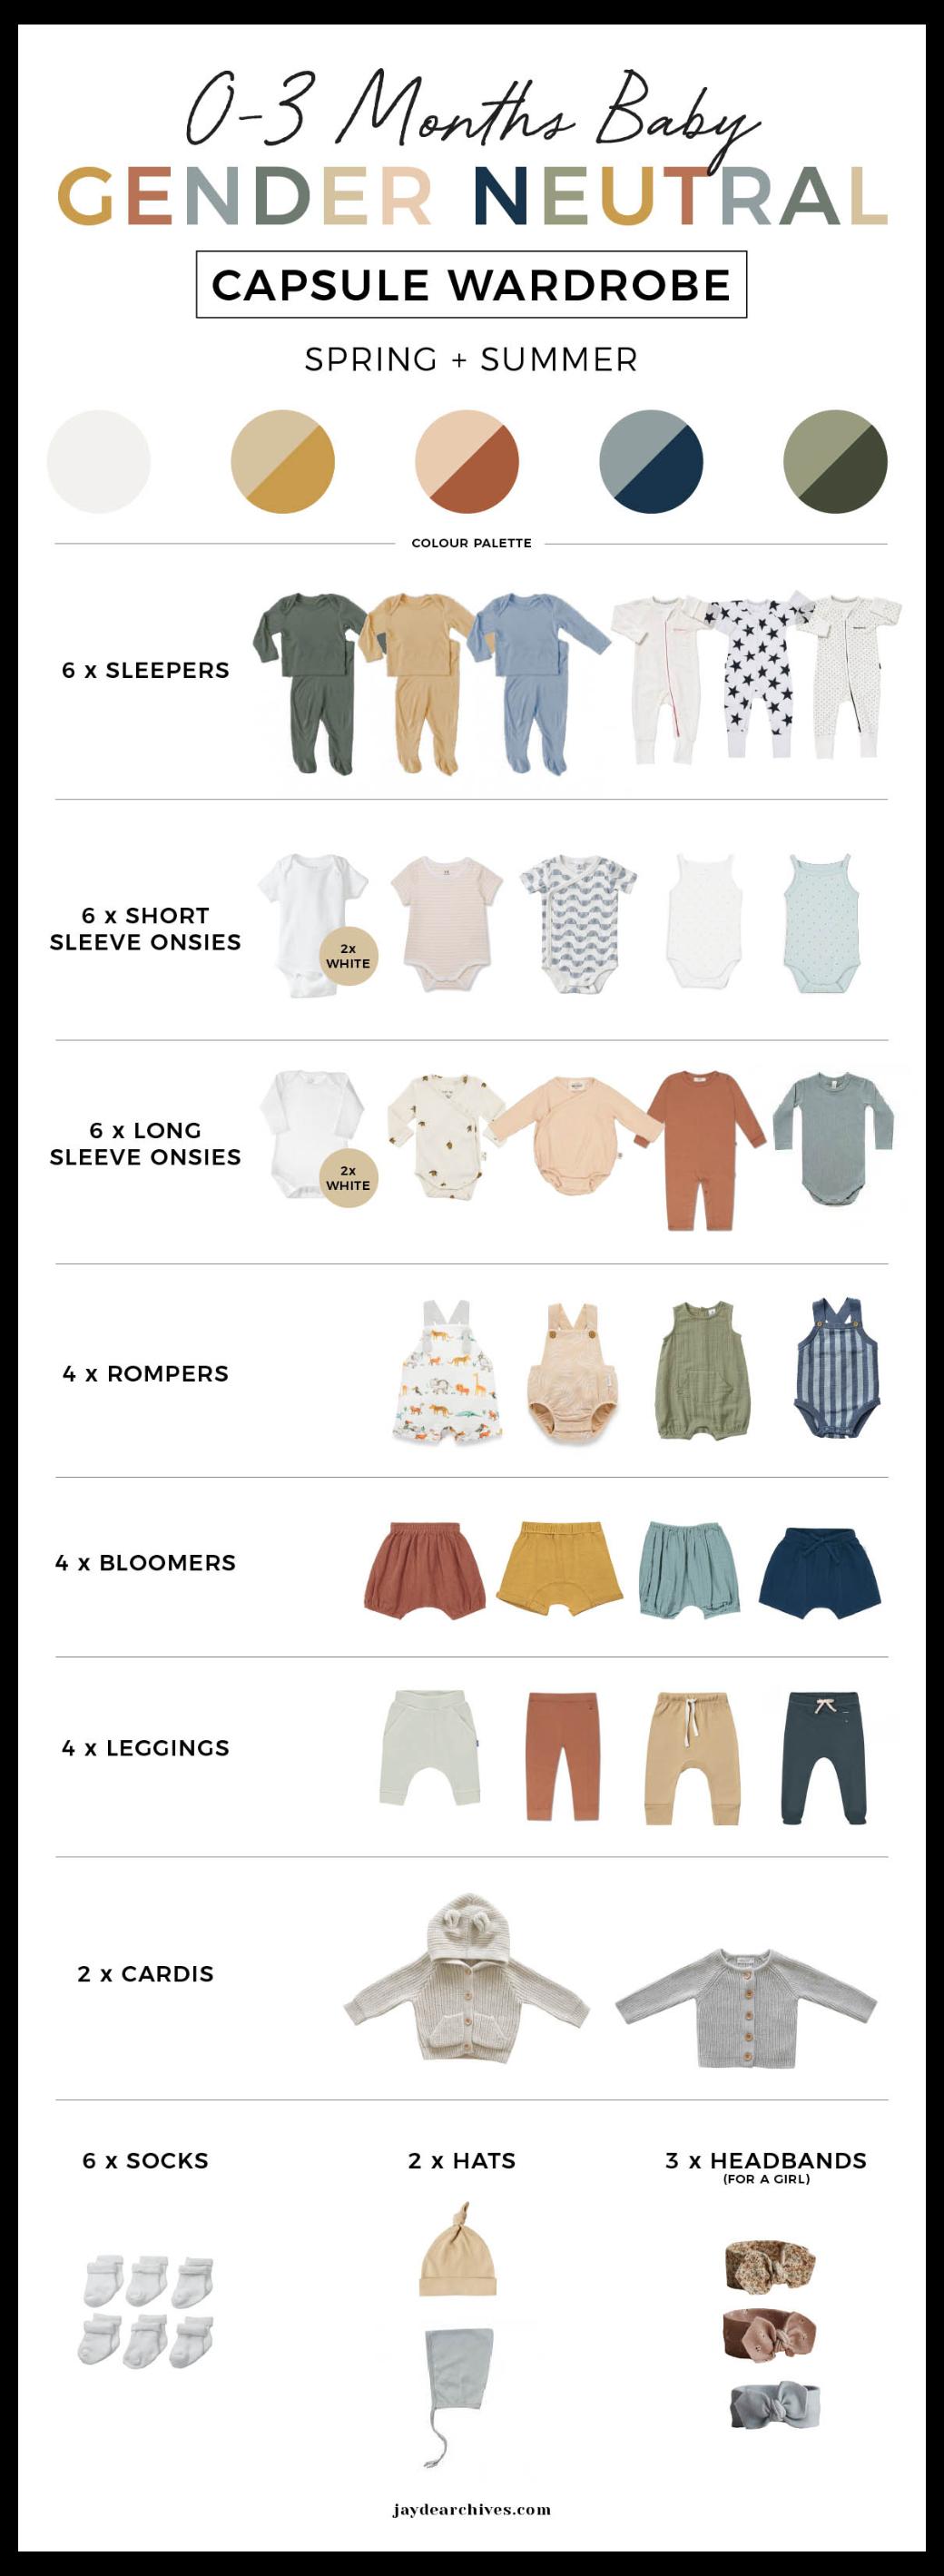 Gender Neutral Baby Capsule Wardrobe Gender Neutral Baby Clothes Genderneutralbab Minimalist Baby Clothes Gender Neutral Baby Clothes Neutral Baby Clothes